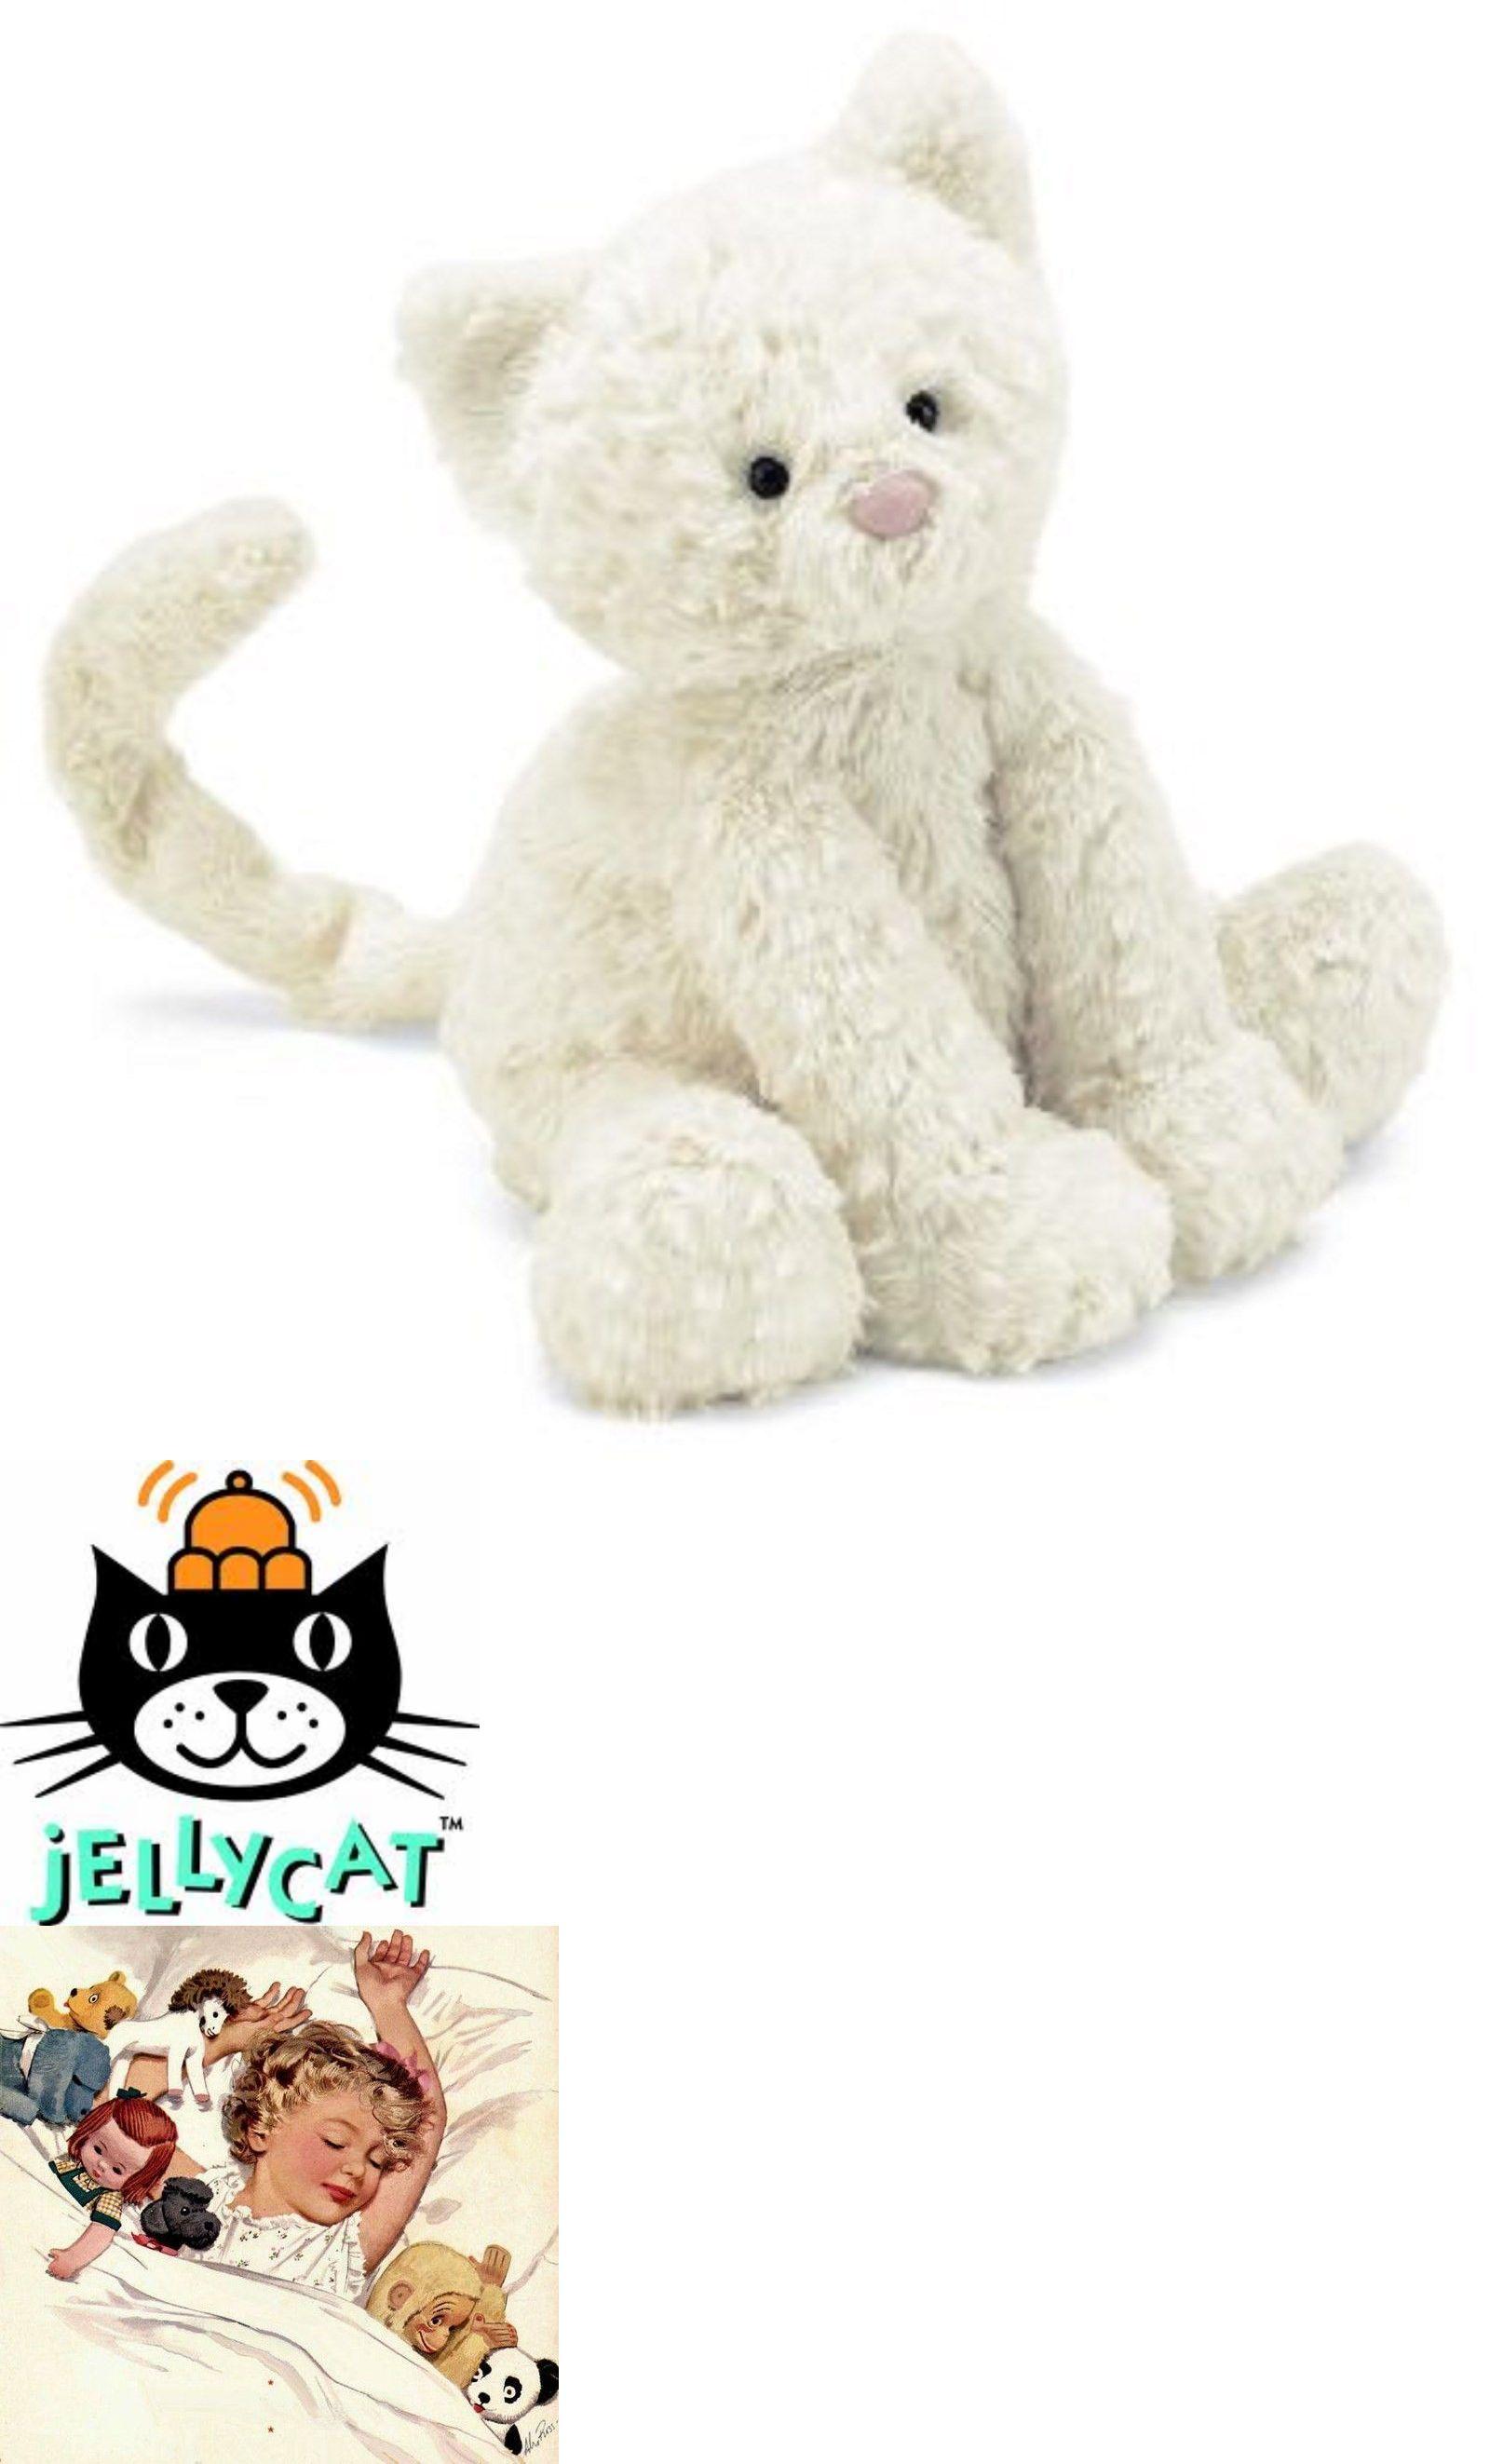 Jellycat 158786 Jellycat Fuddlewuddle Kitty New With Tags Buy It Now Only 26 99 On Ebay Jellycat Fuddlewuddle Monkey Stuffed Animal Jellycat Animals